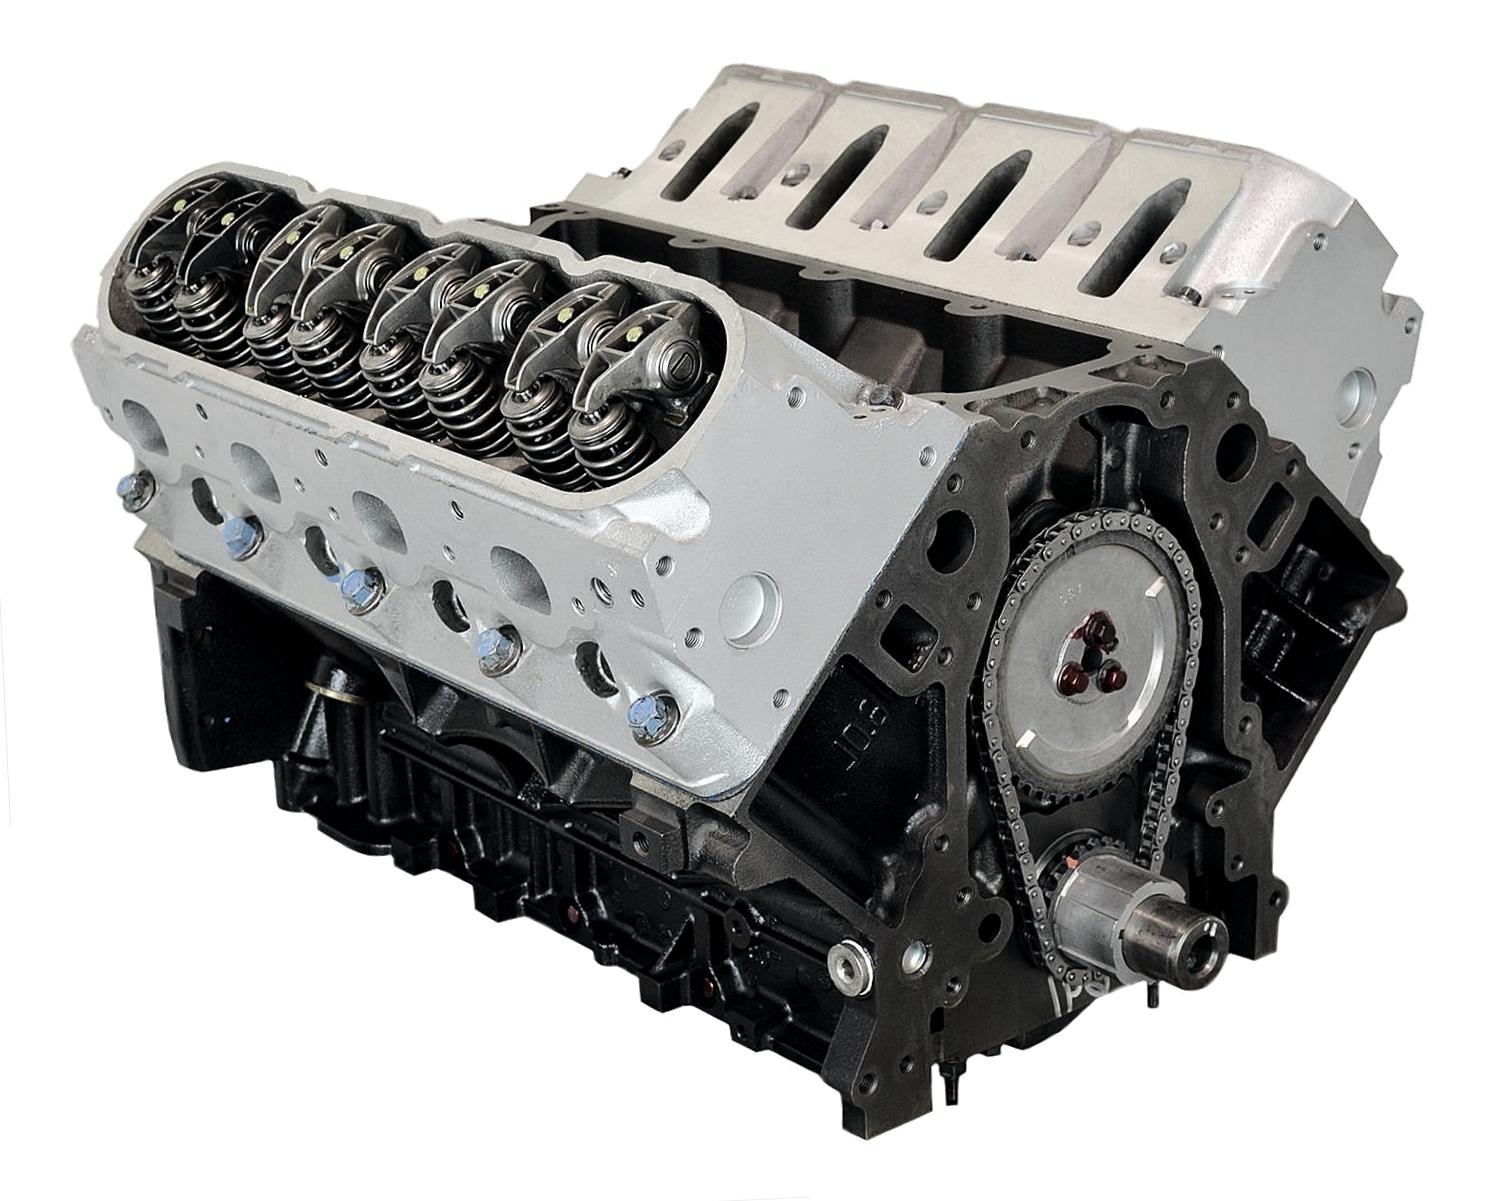 GMC Yukon XL 1500 - 5.3 LM7 Engine - 2000-2006 (Vin Code: T)